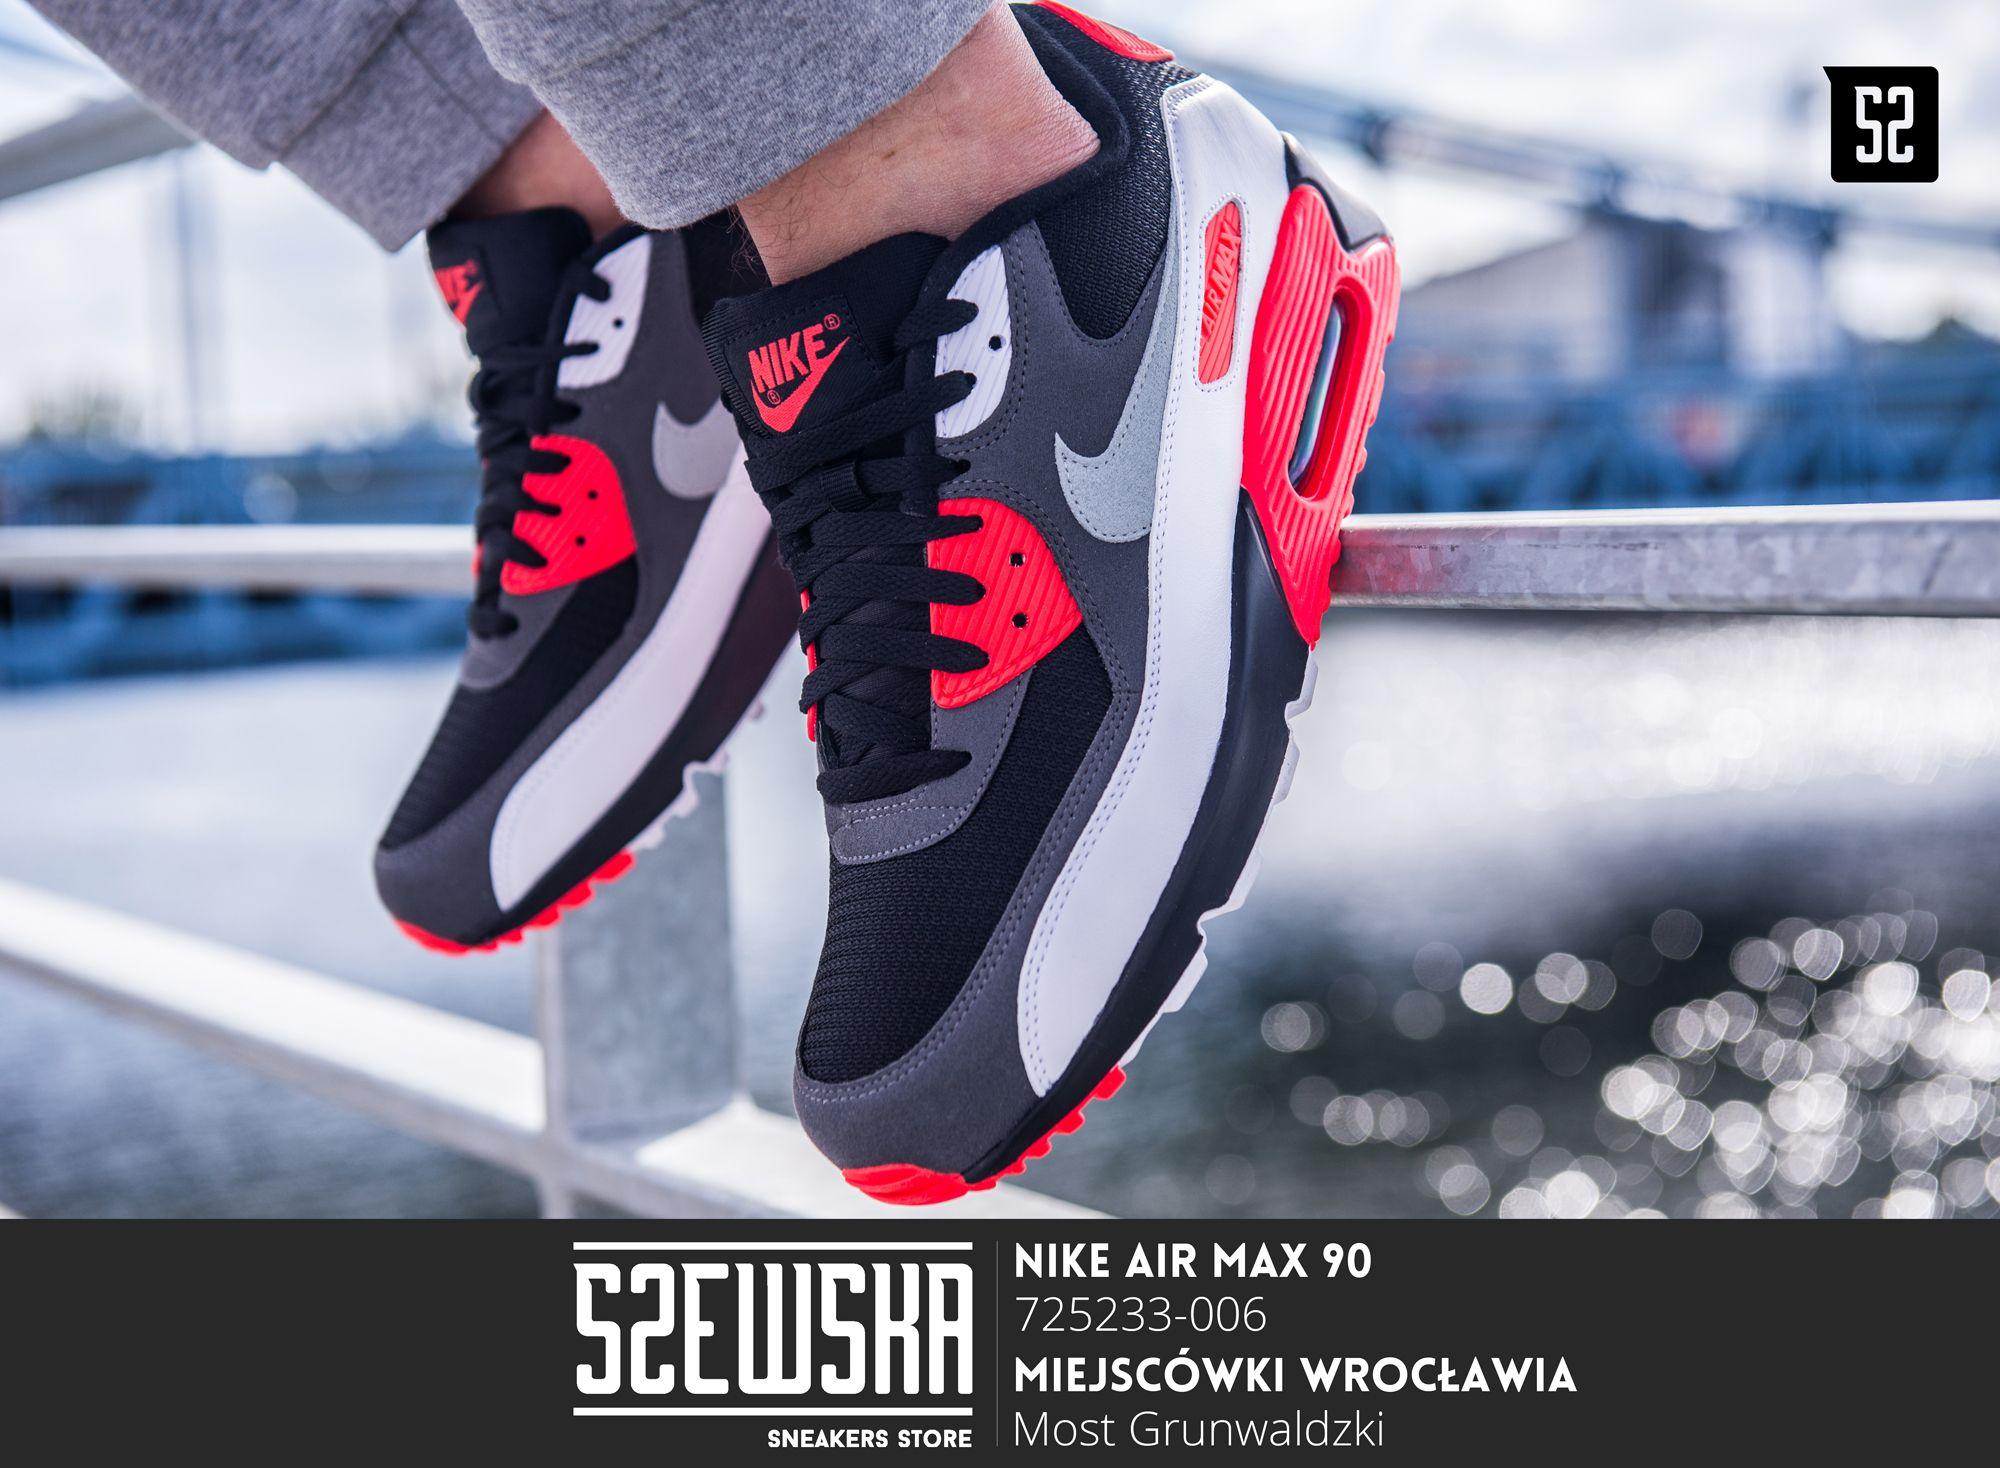 Nike Air Max 90 725233 006 Szewska Sneakers Store E Szewska Pl Nike Air Max Nike Air Max 90 Sneaker Stores